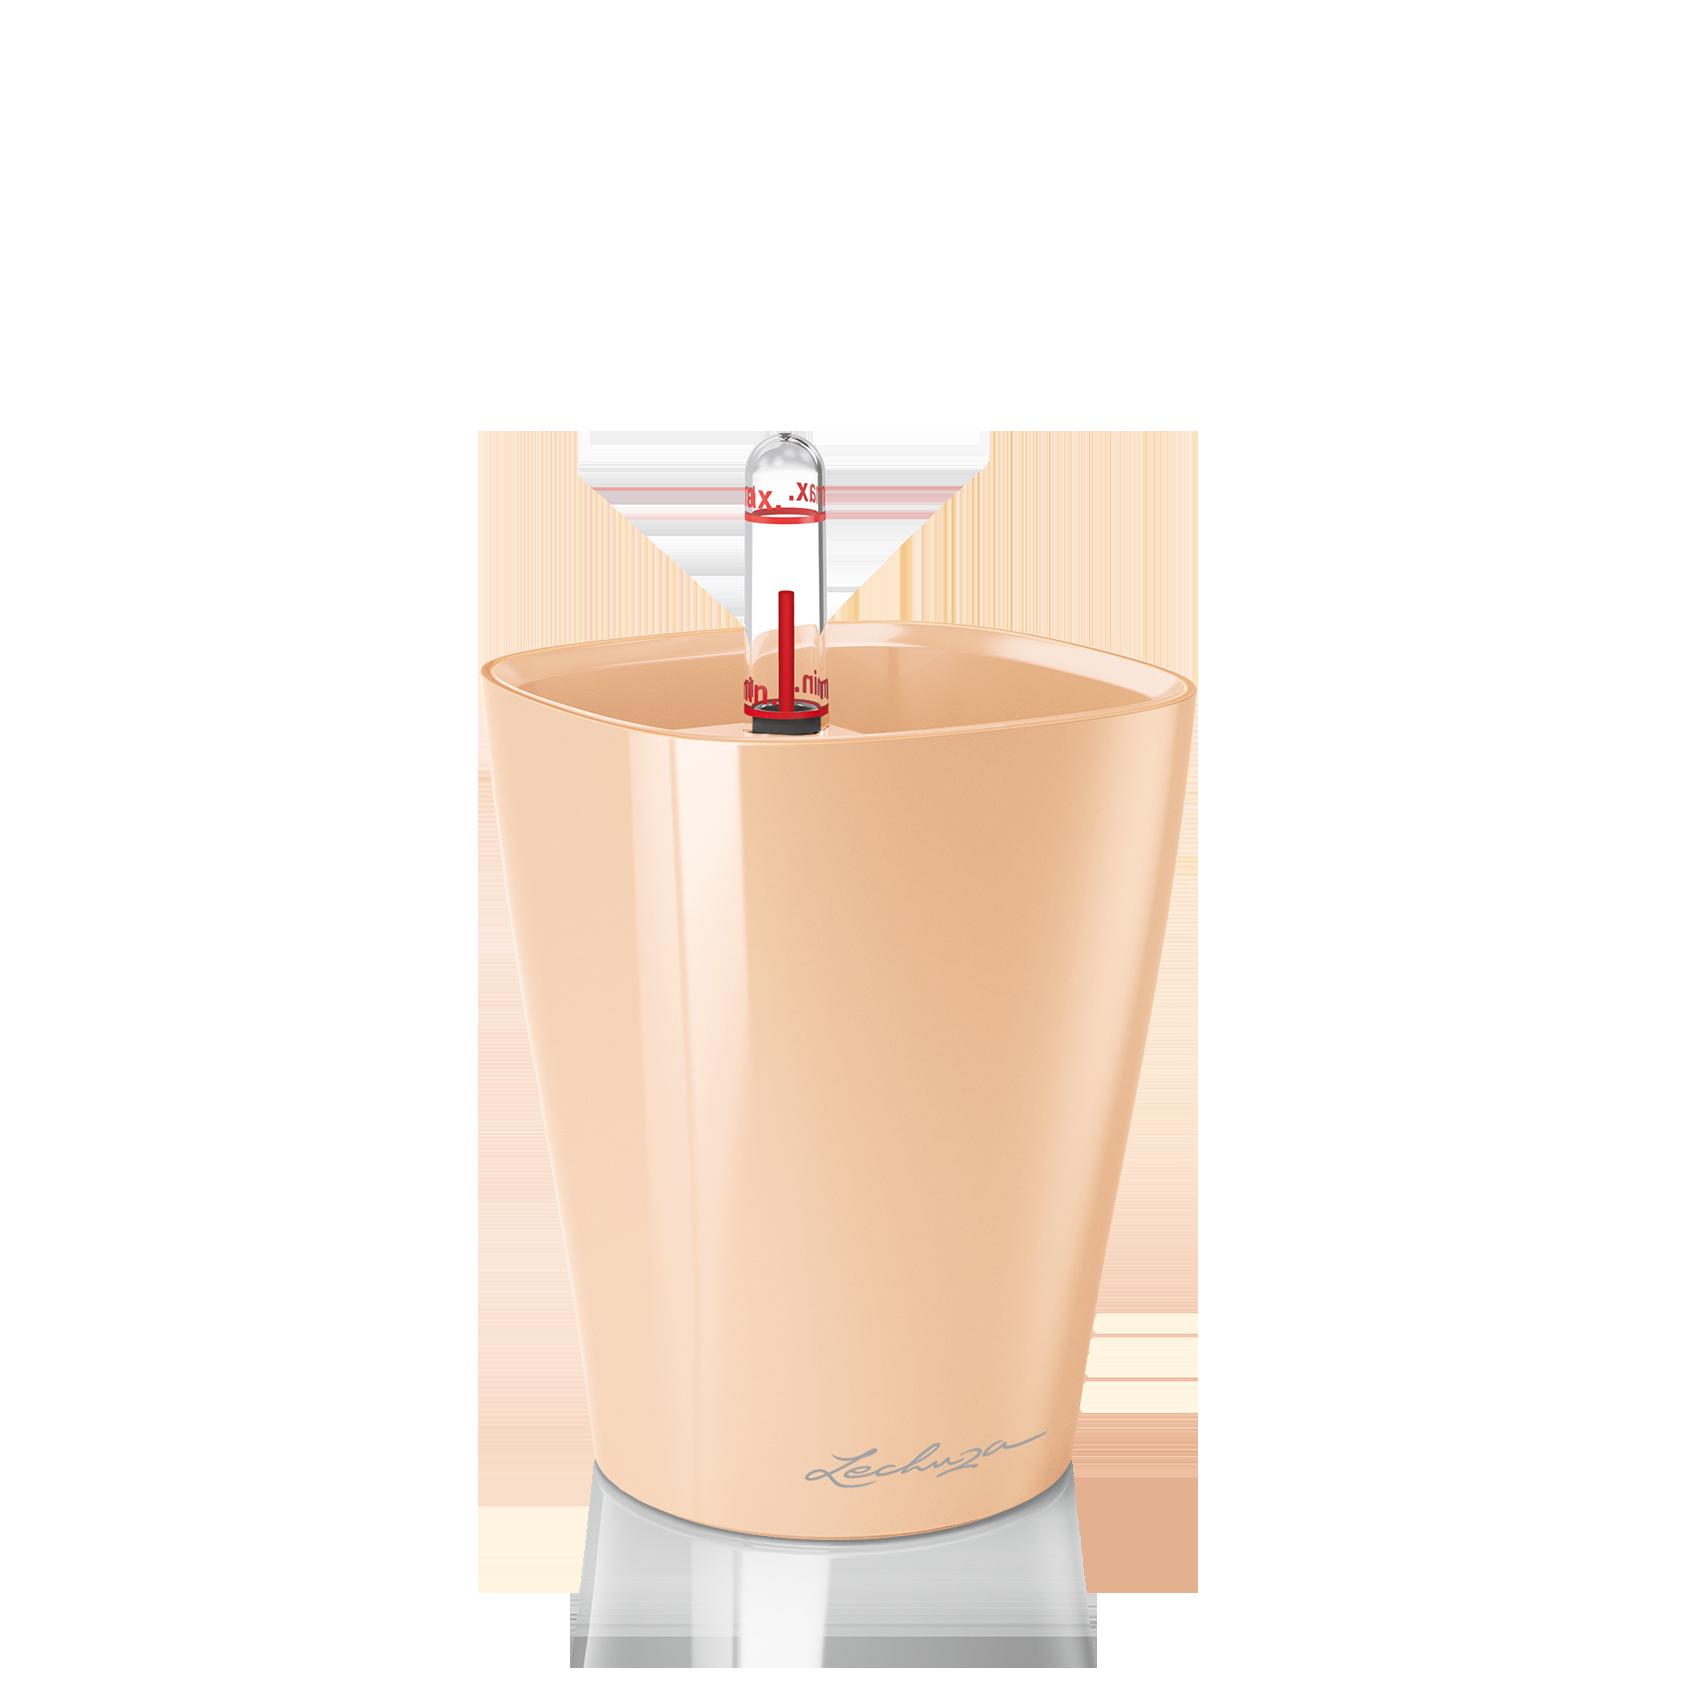 MINI-DELTINI apricot high-gloss